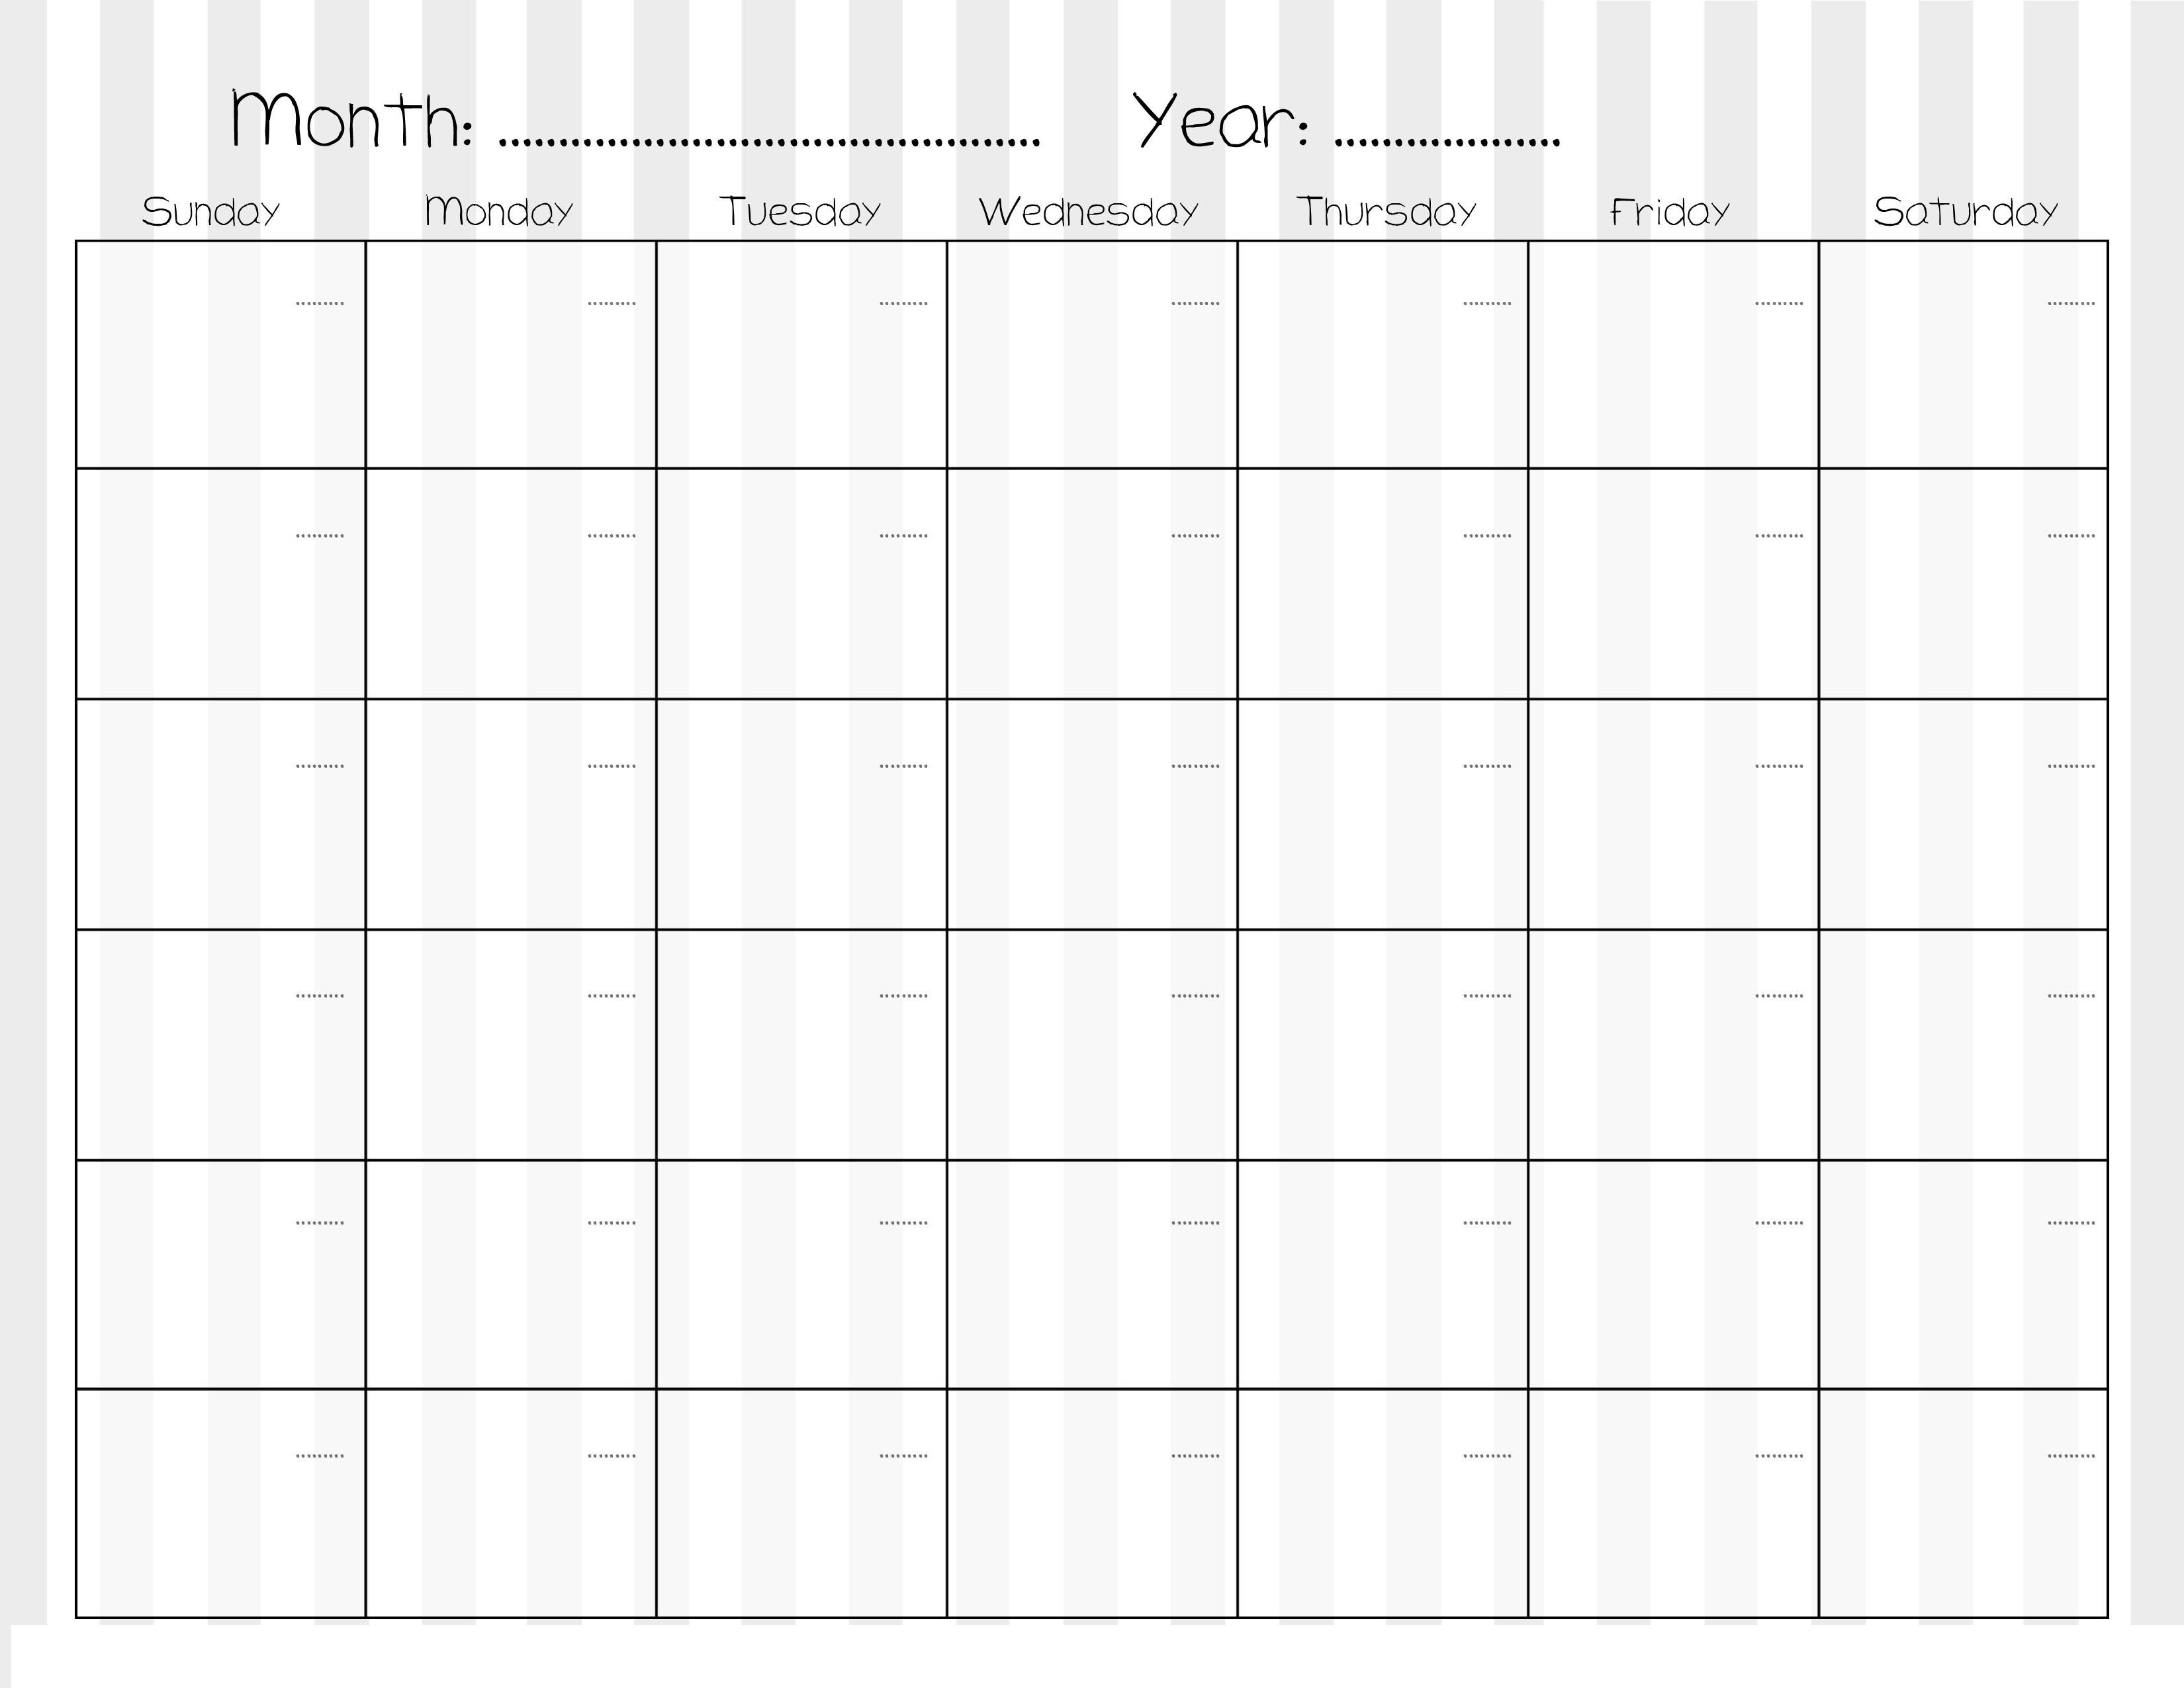 Sample Calendars To Print